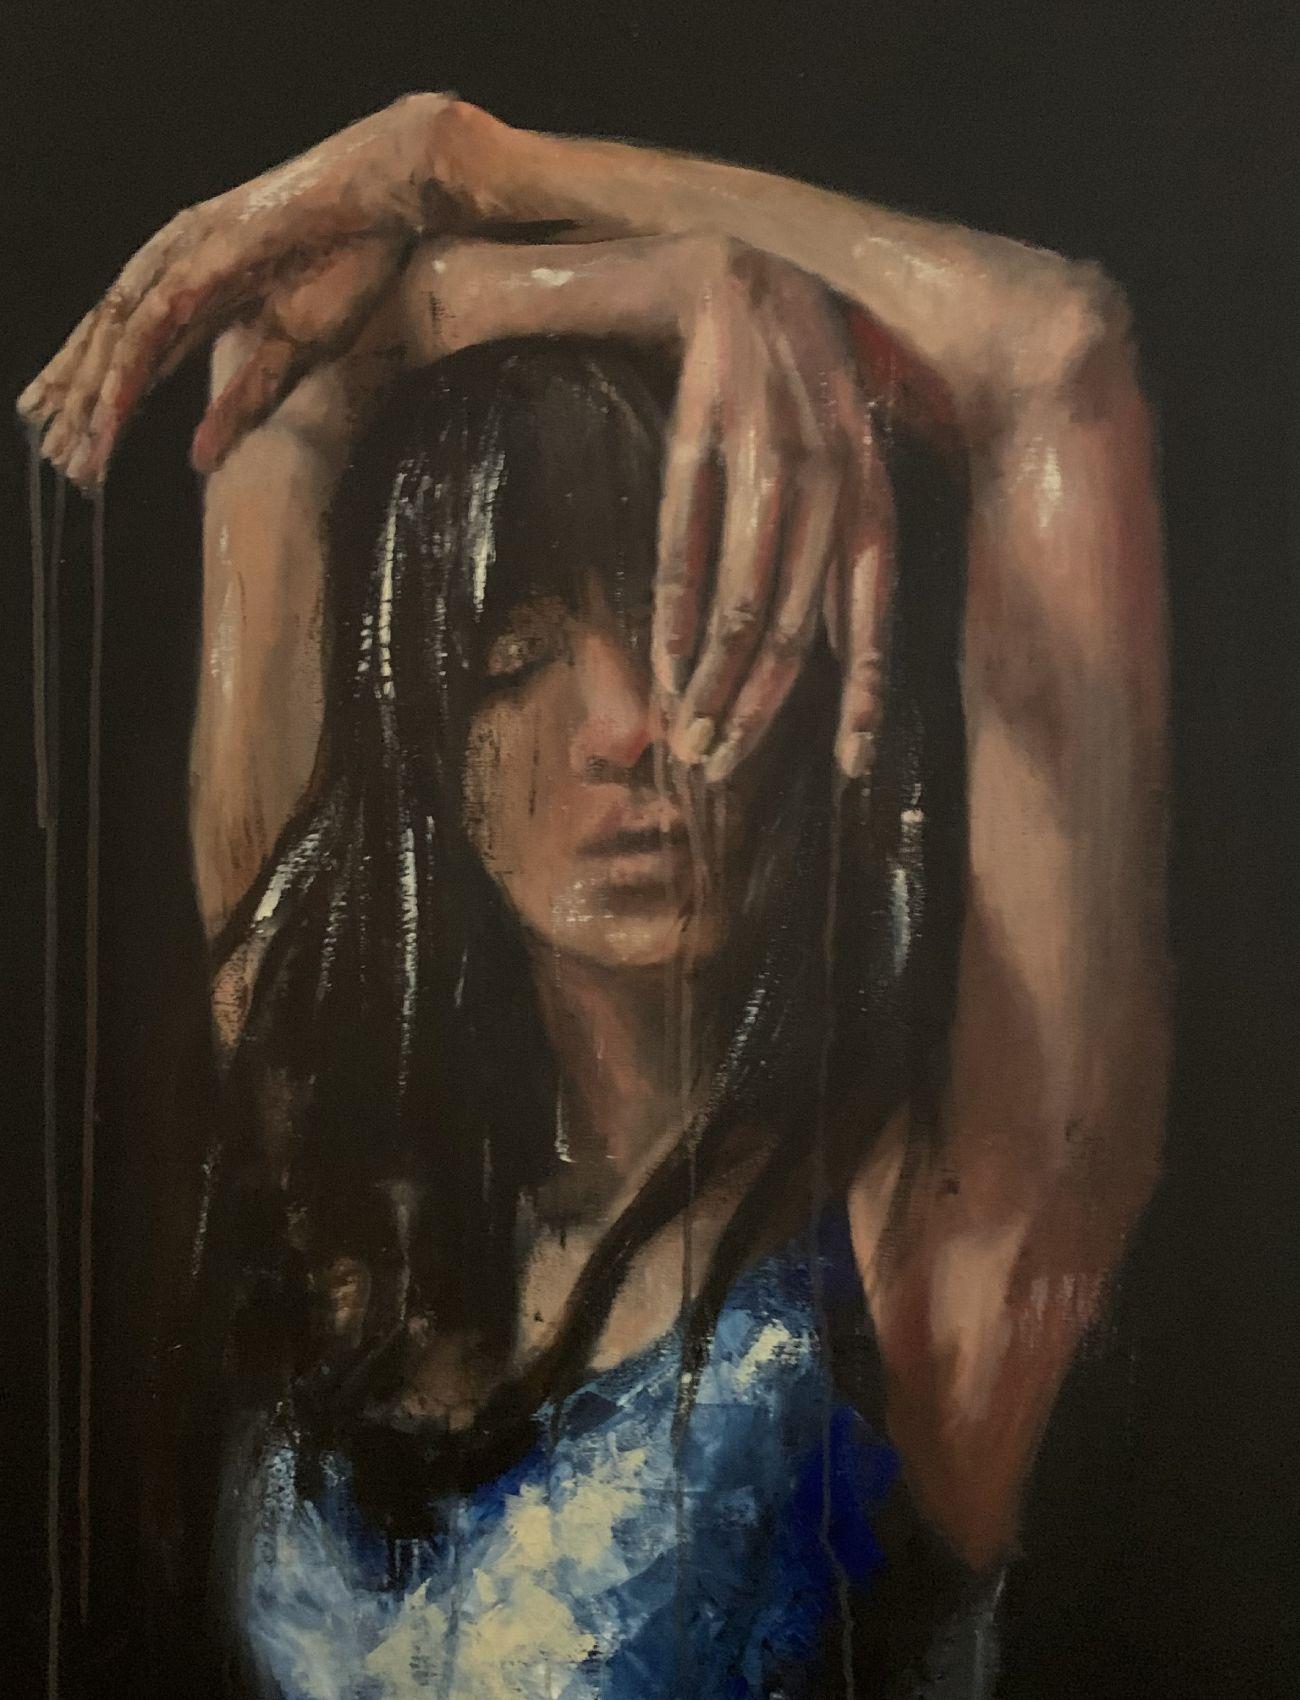 Dancer | 30 x 40 inches